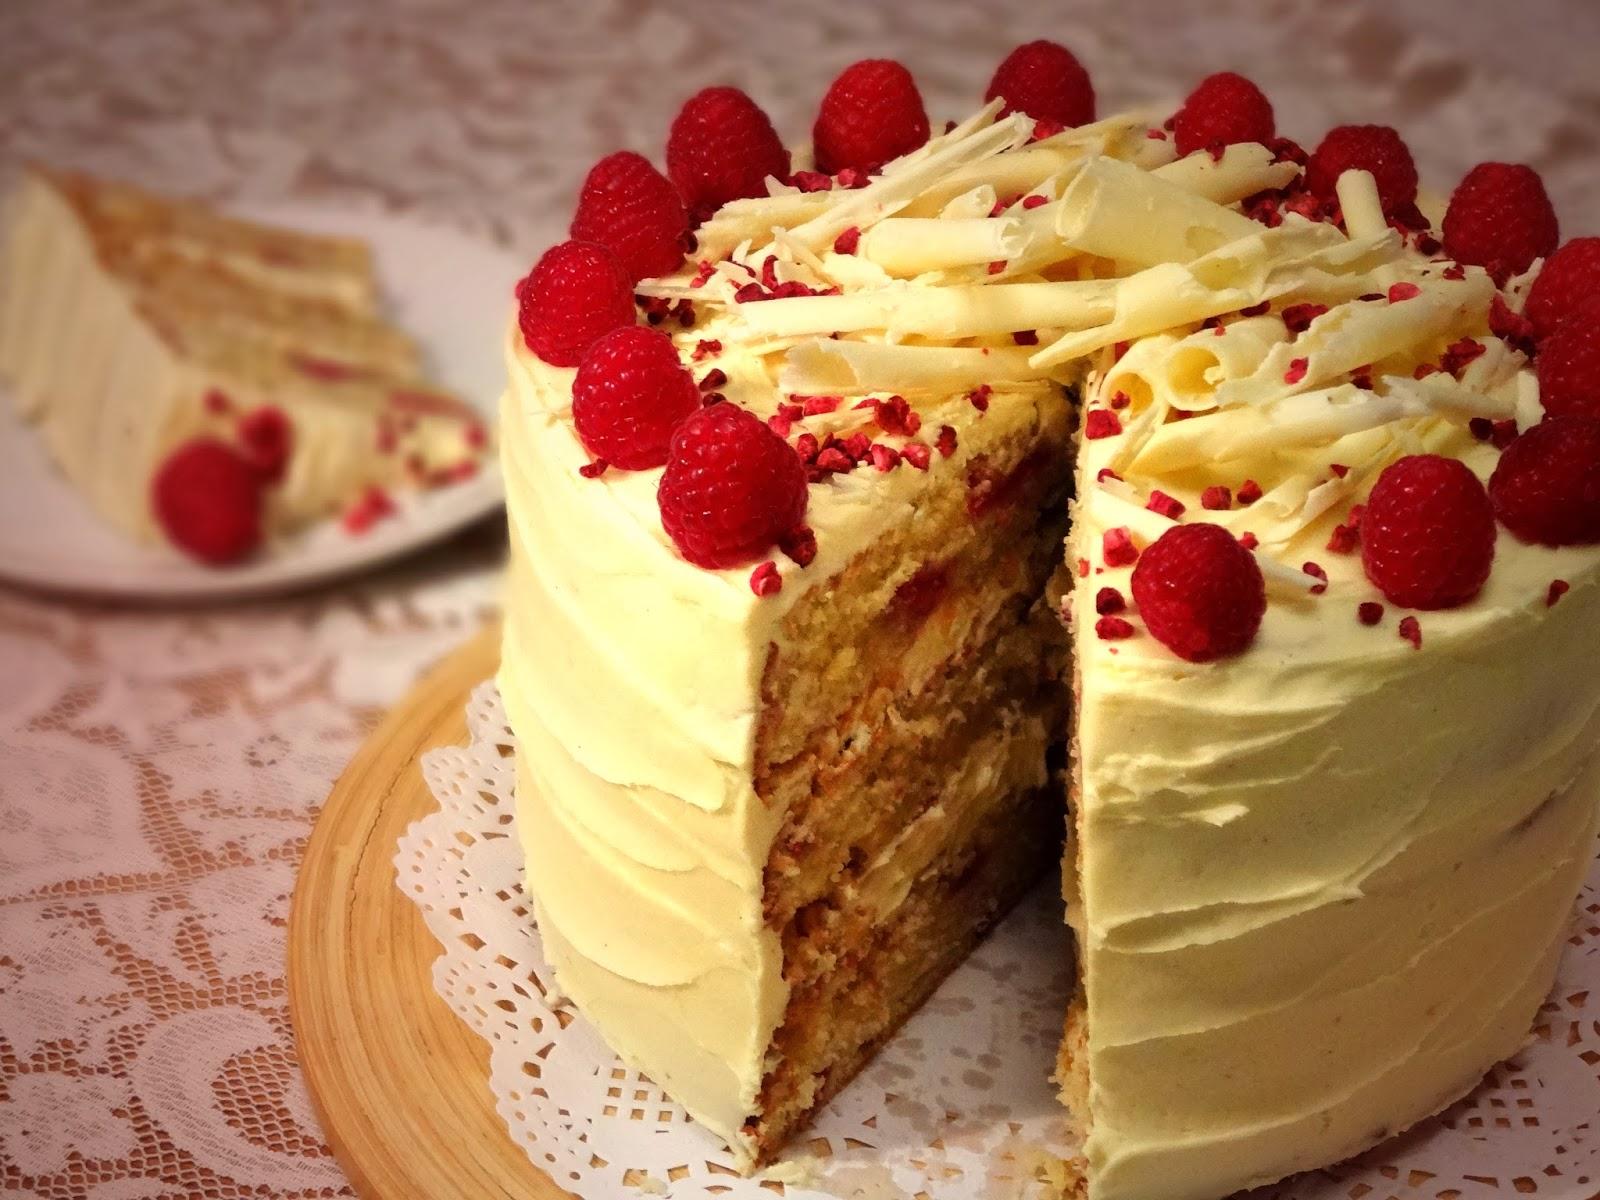 White Chocolate Sponge Cake